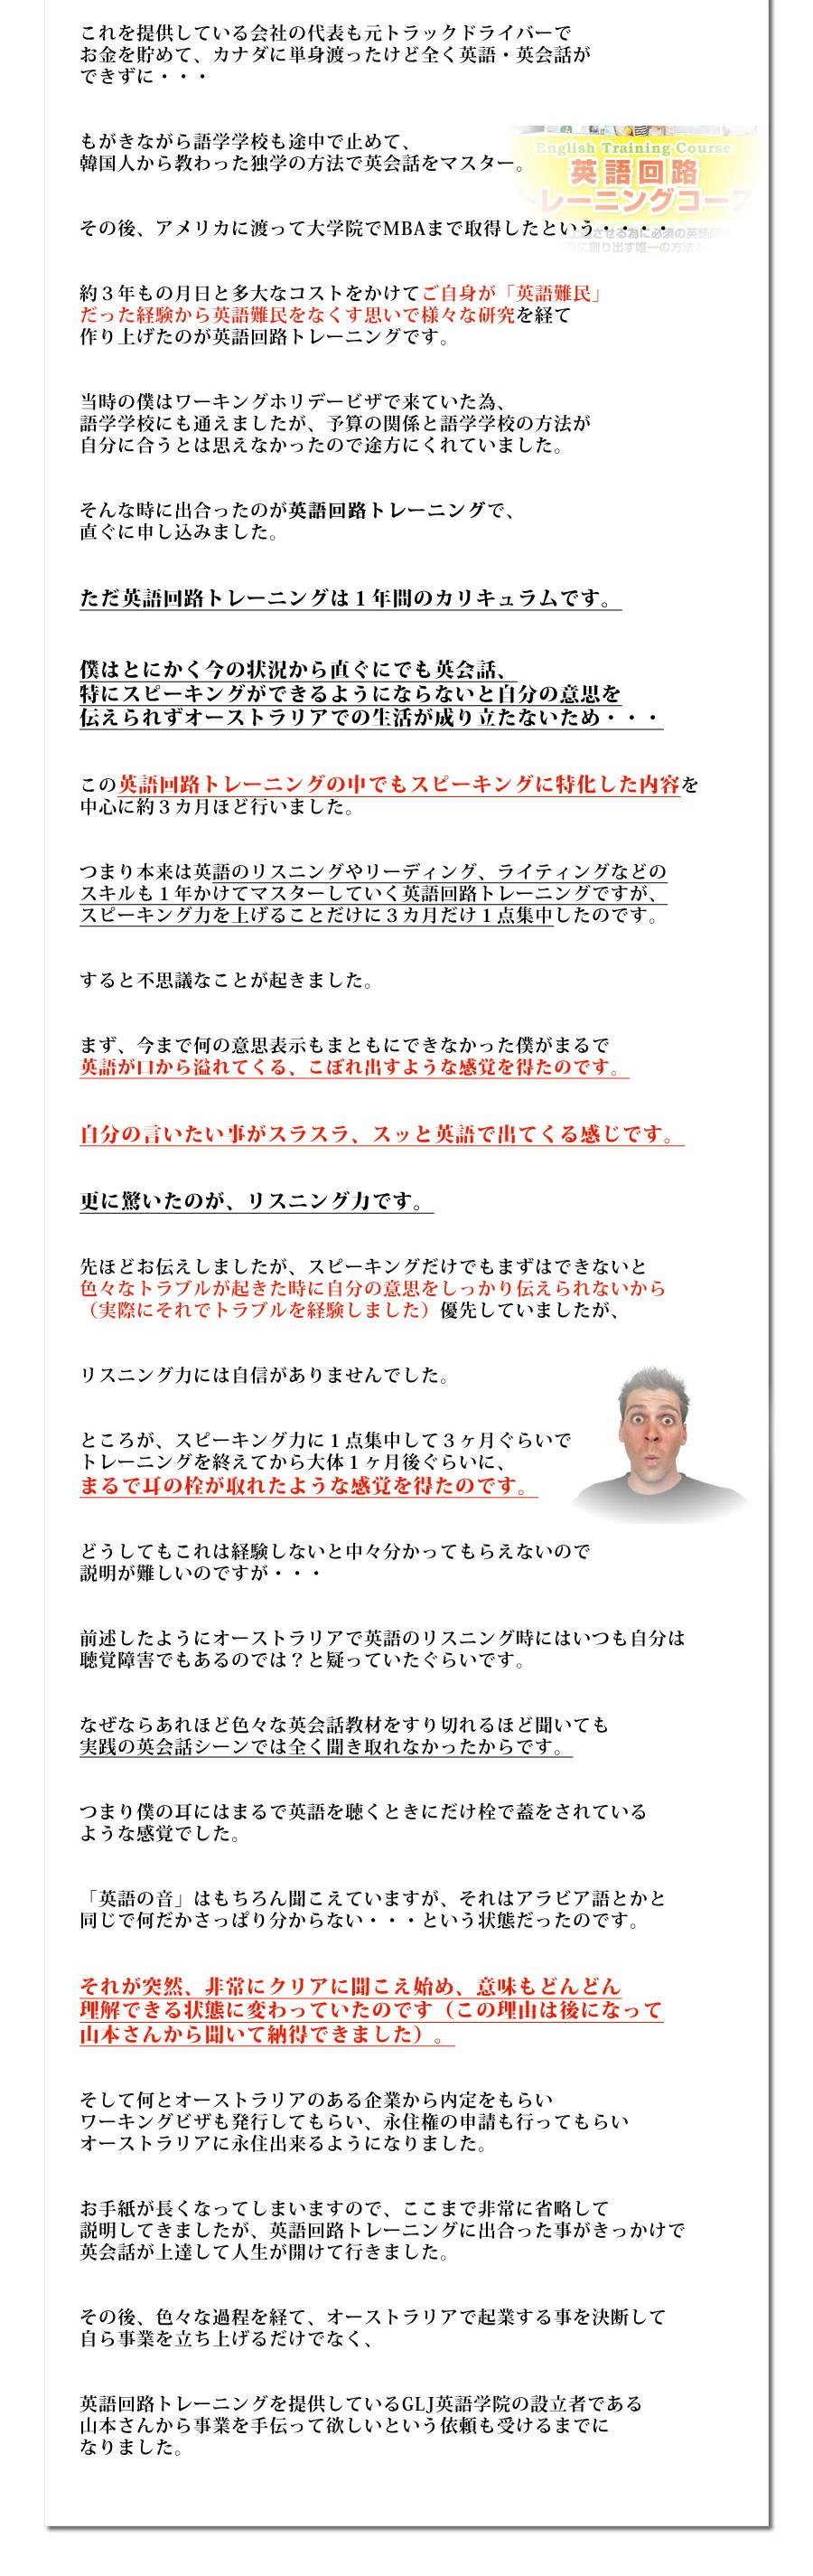 fs-message-3